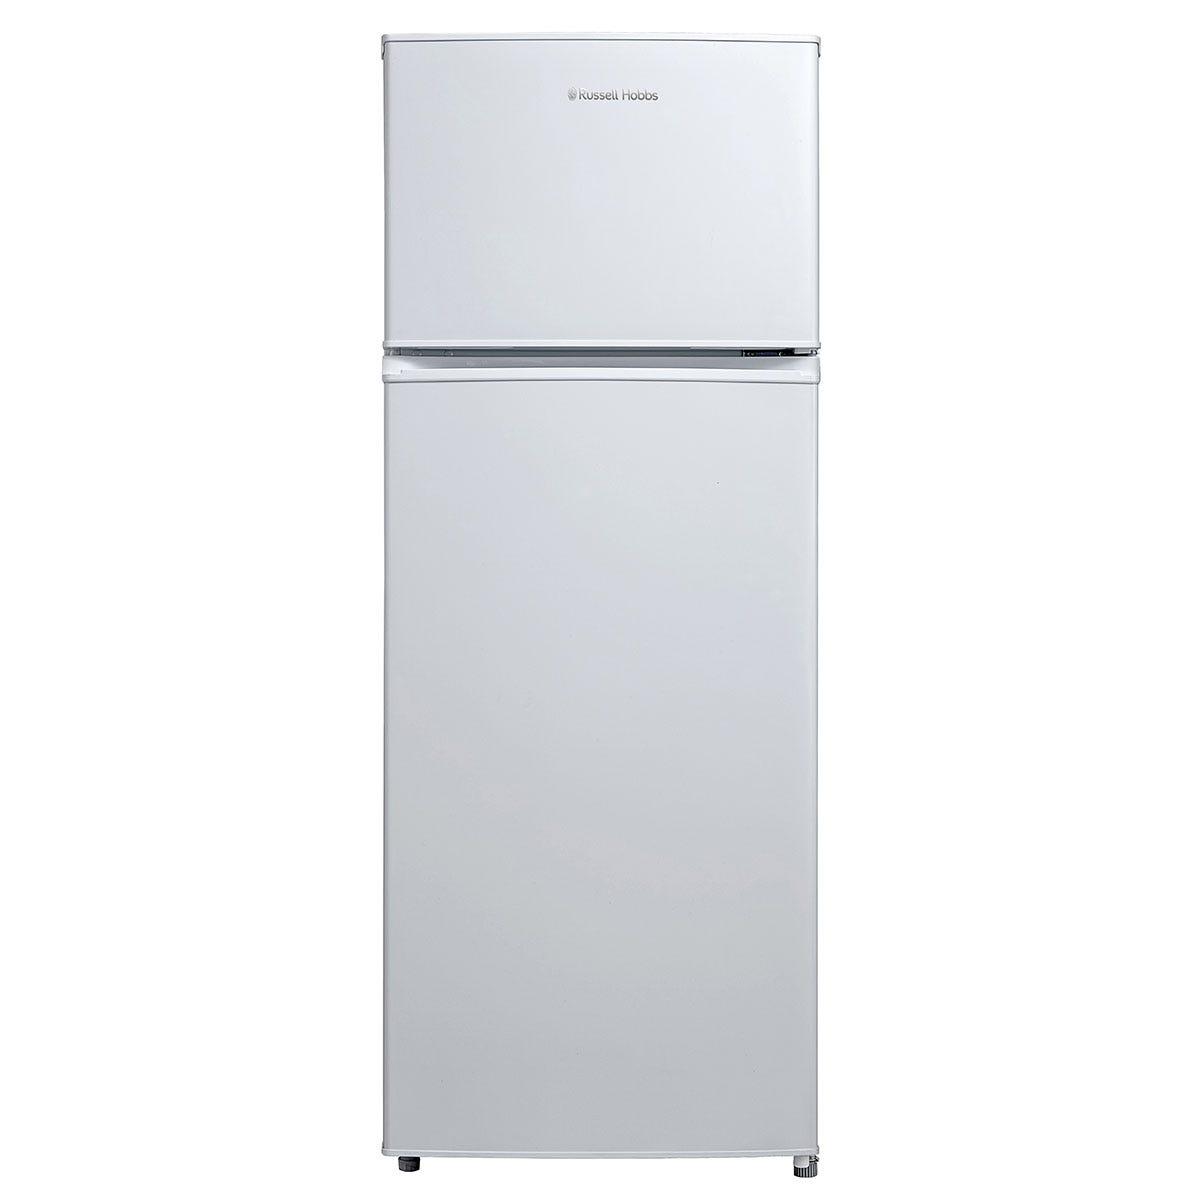 Russell Hobbs RH55TMFF143 205L Fridge Freezer - White